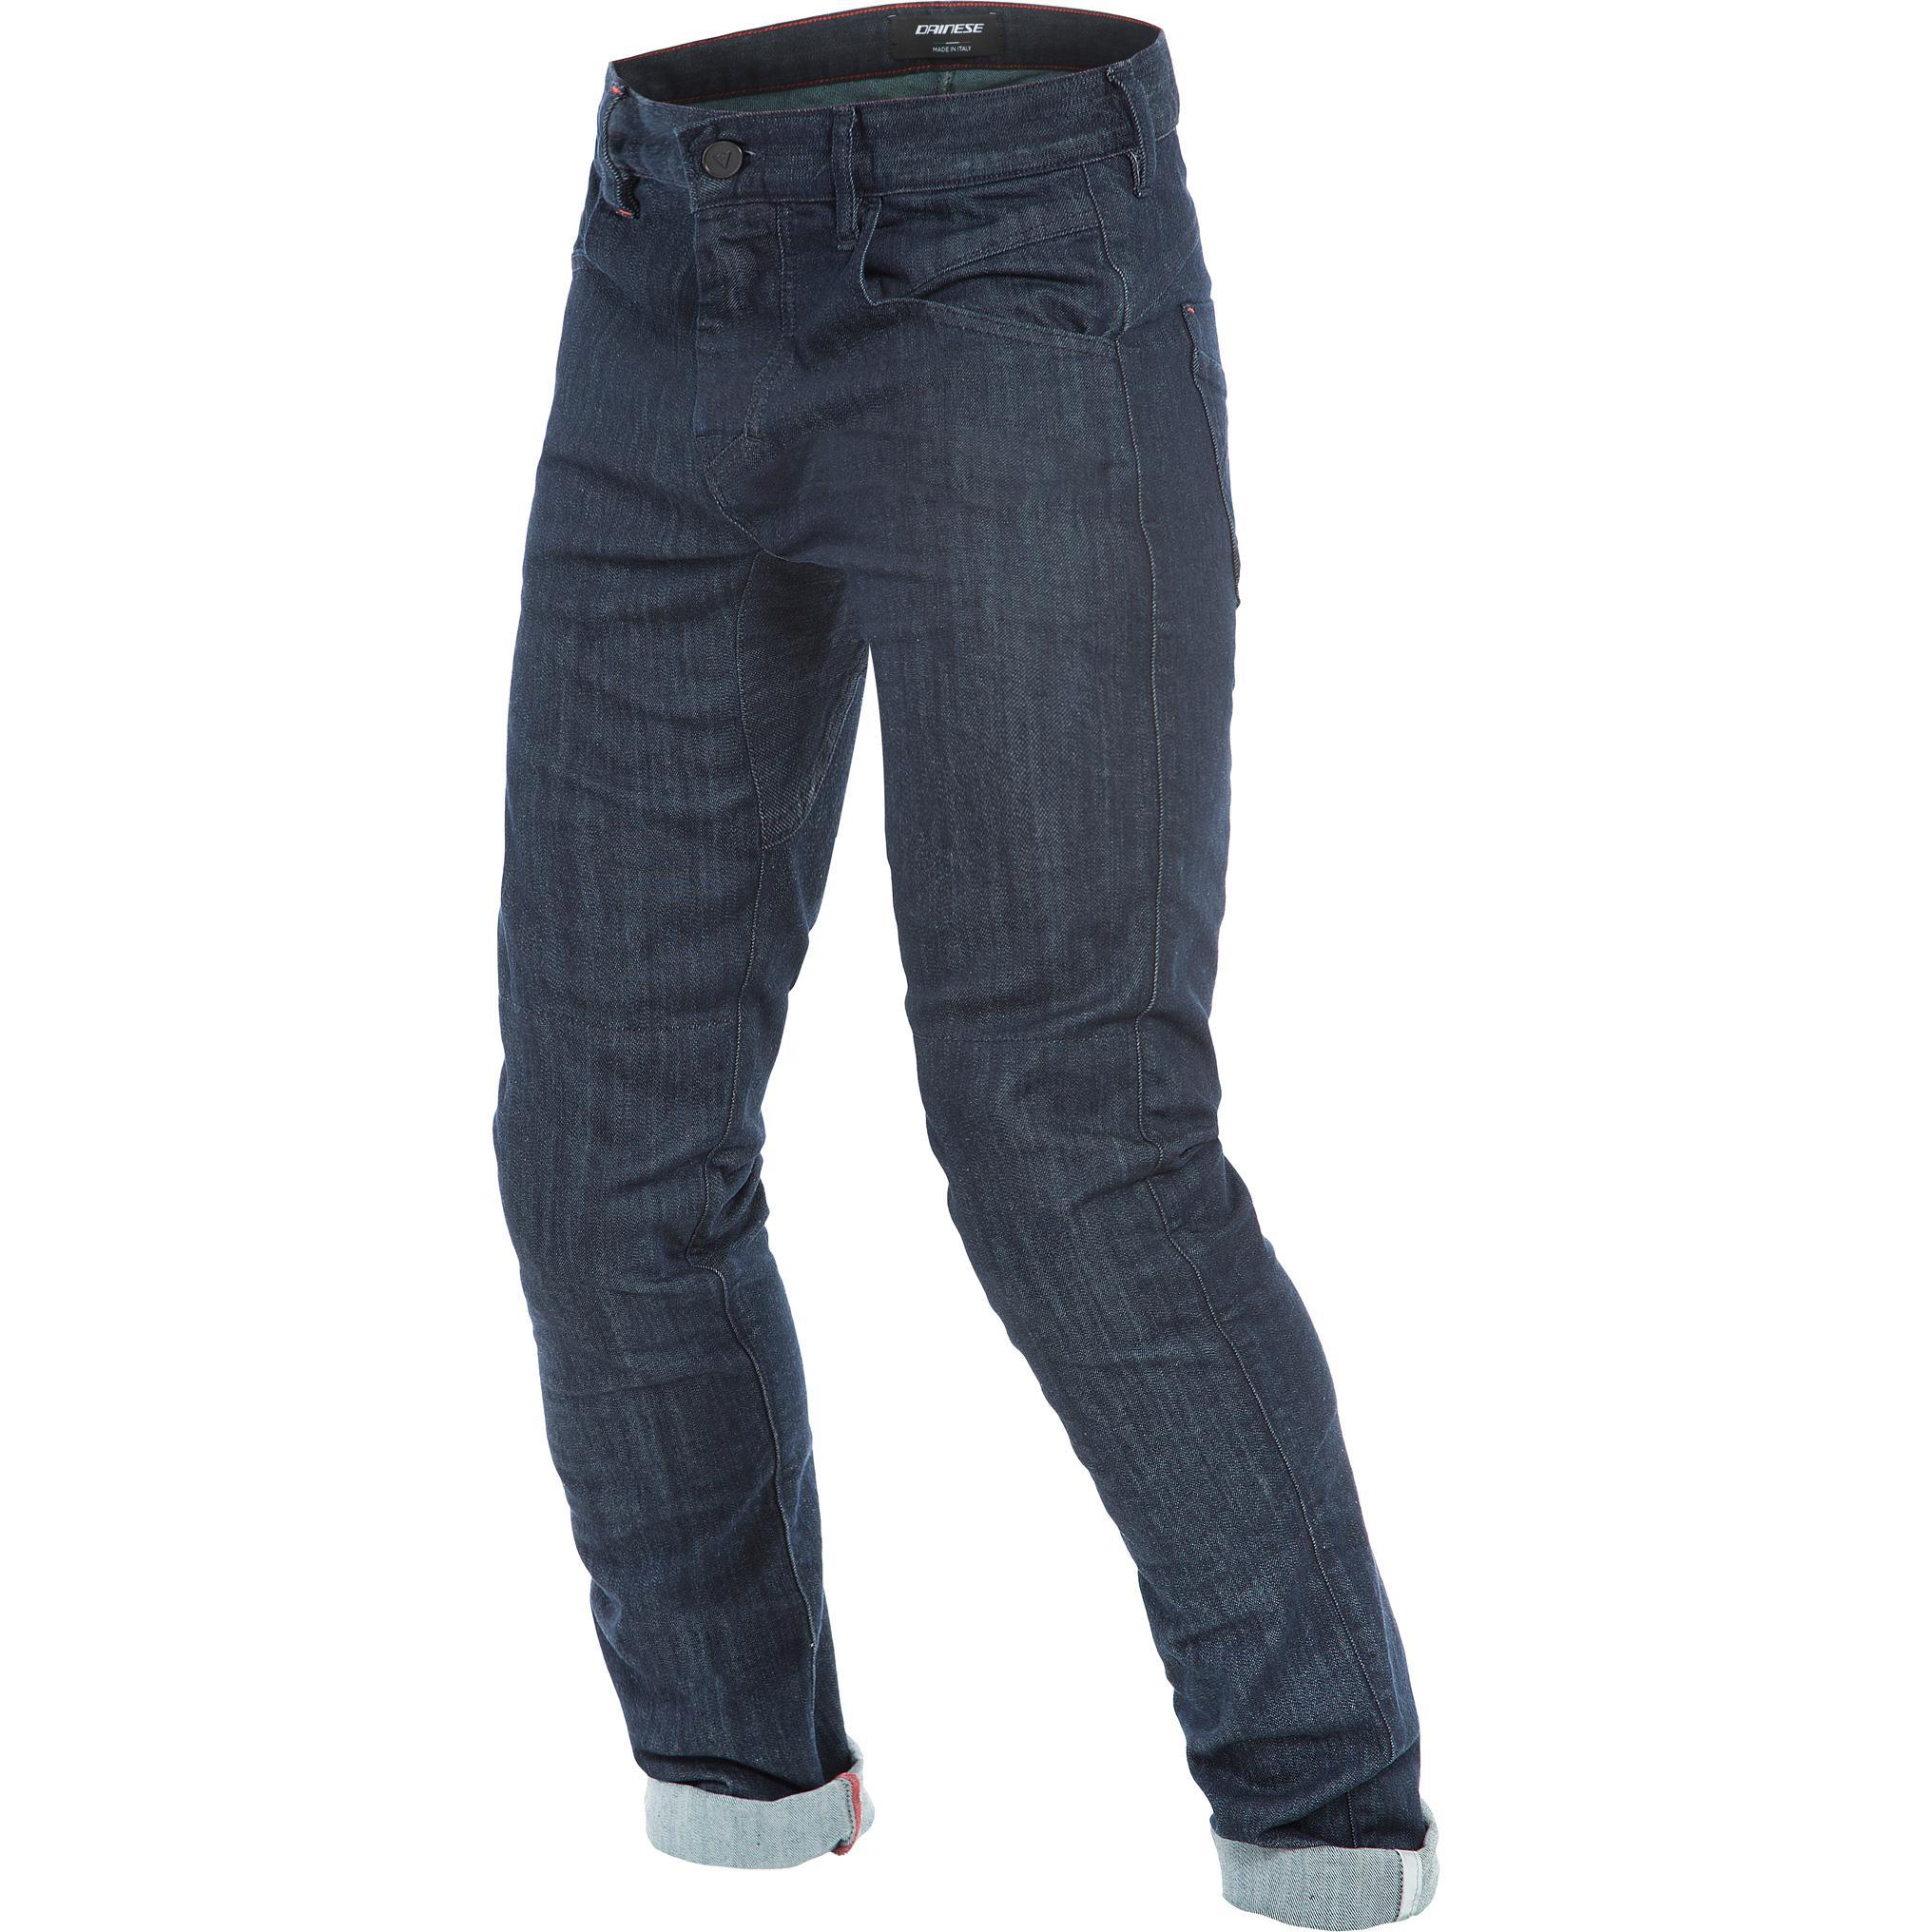 DAINESE-jeans-trento-slim-image-10938944